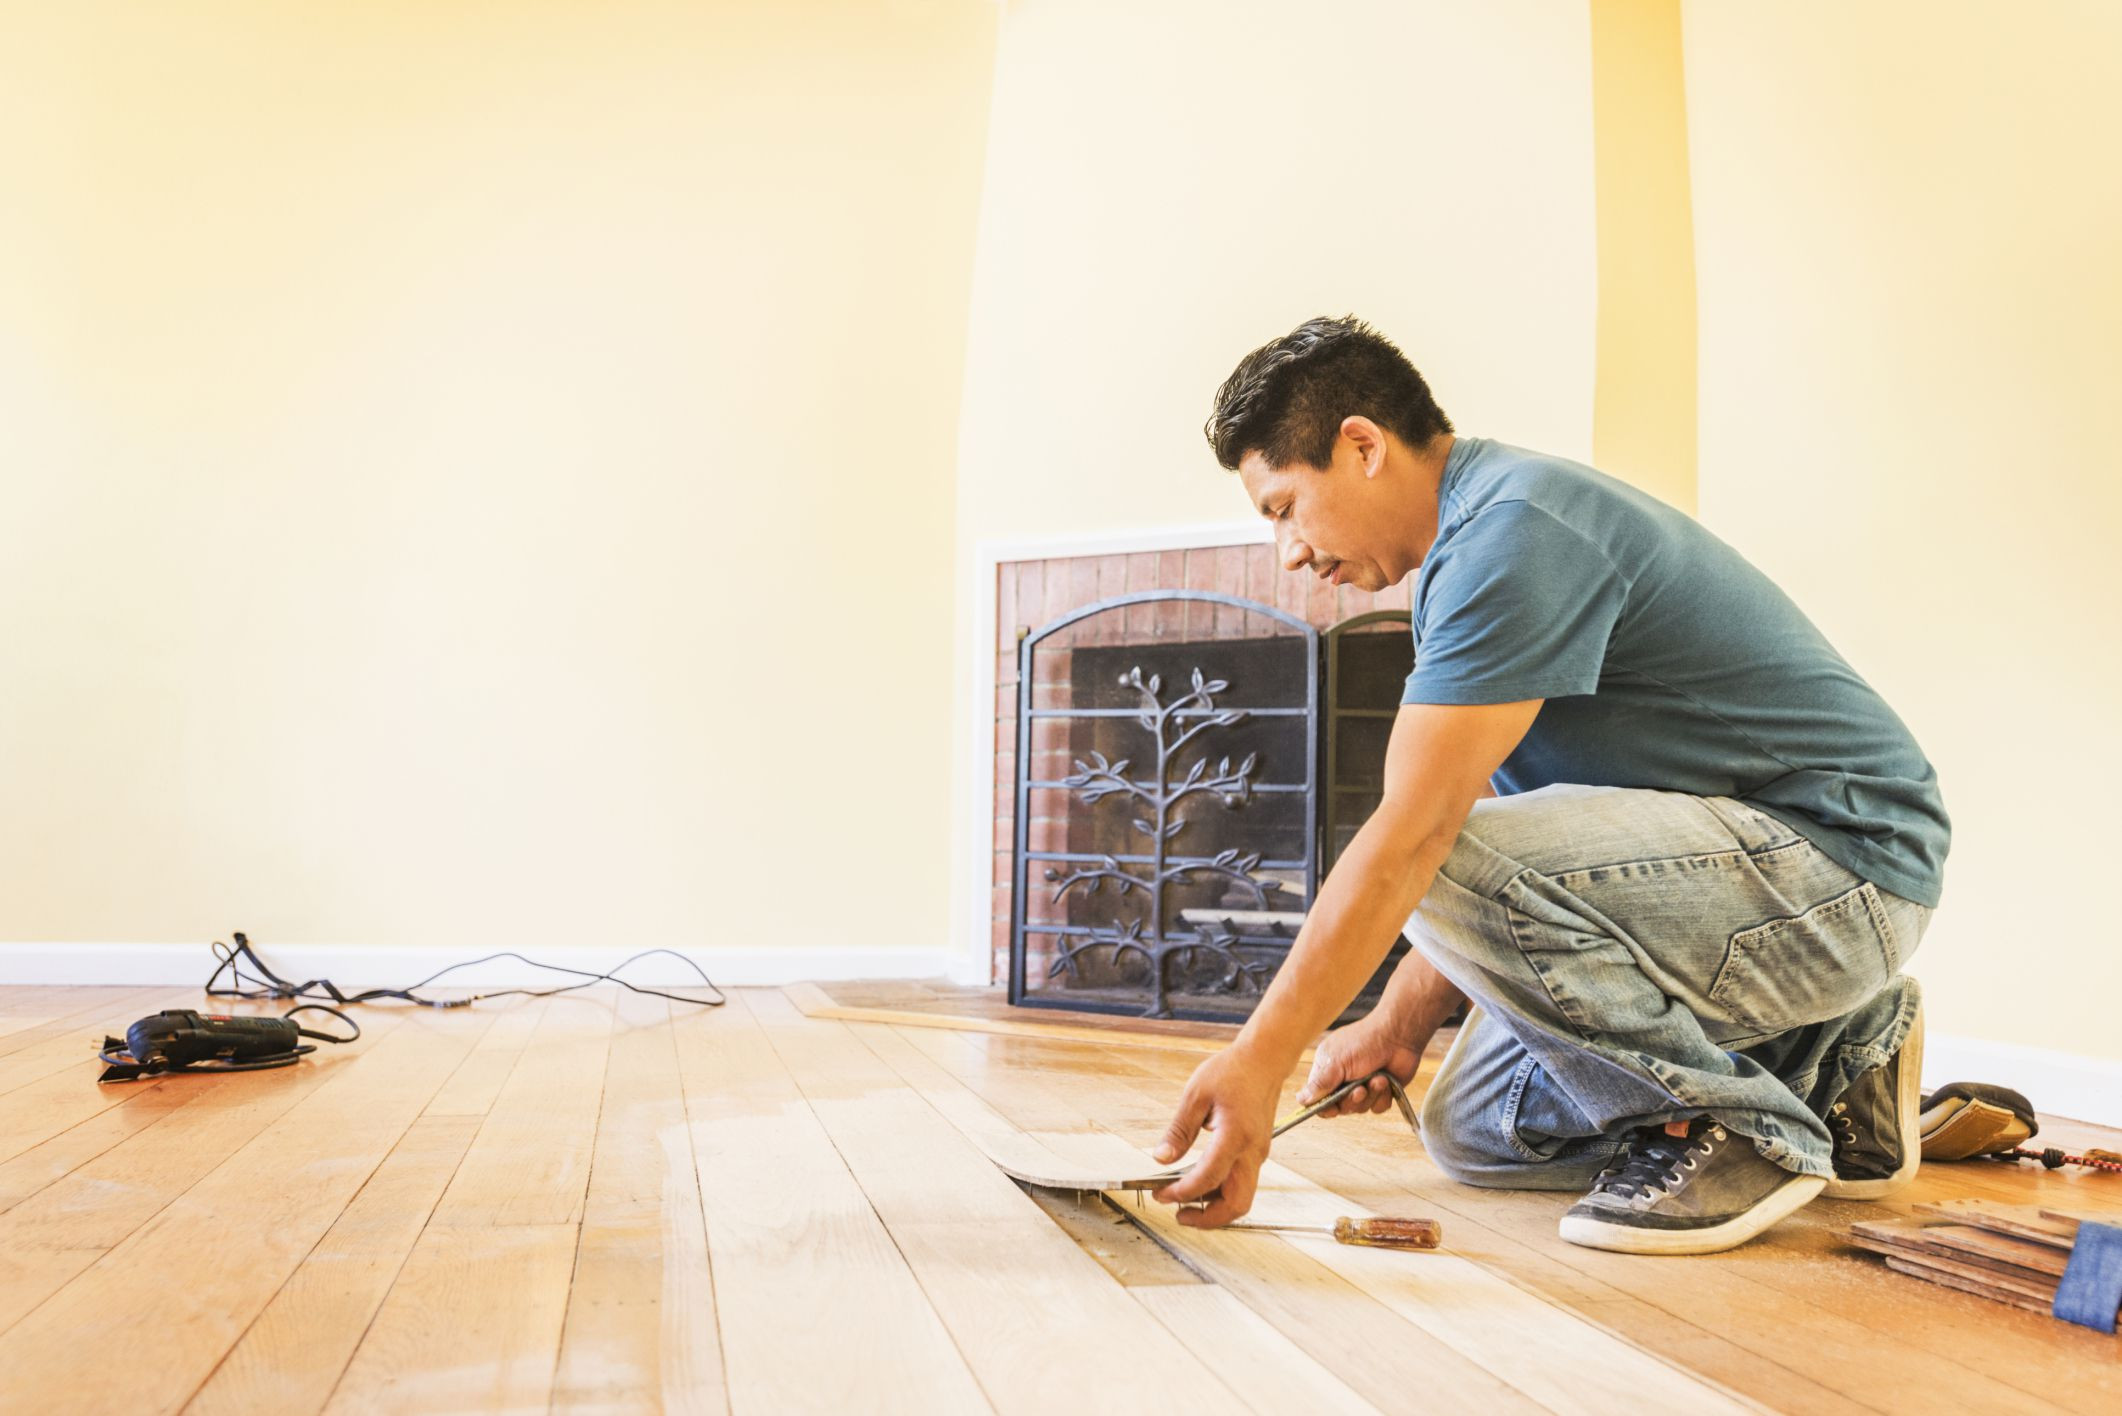 3 4 inch hardwood flooring of solid hardwood flooring costs for professional vs diy regarding installwoodflooring 592016327 56684d6f3df78ce1610a598a